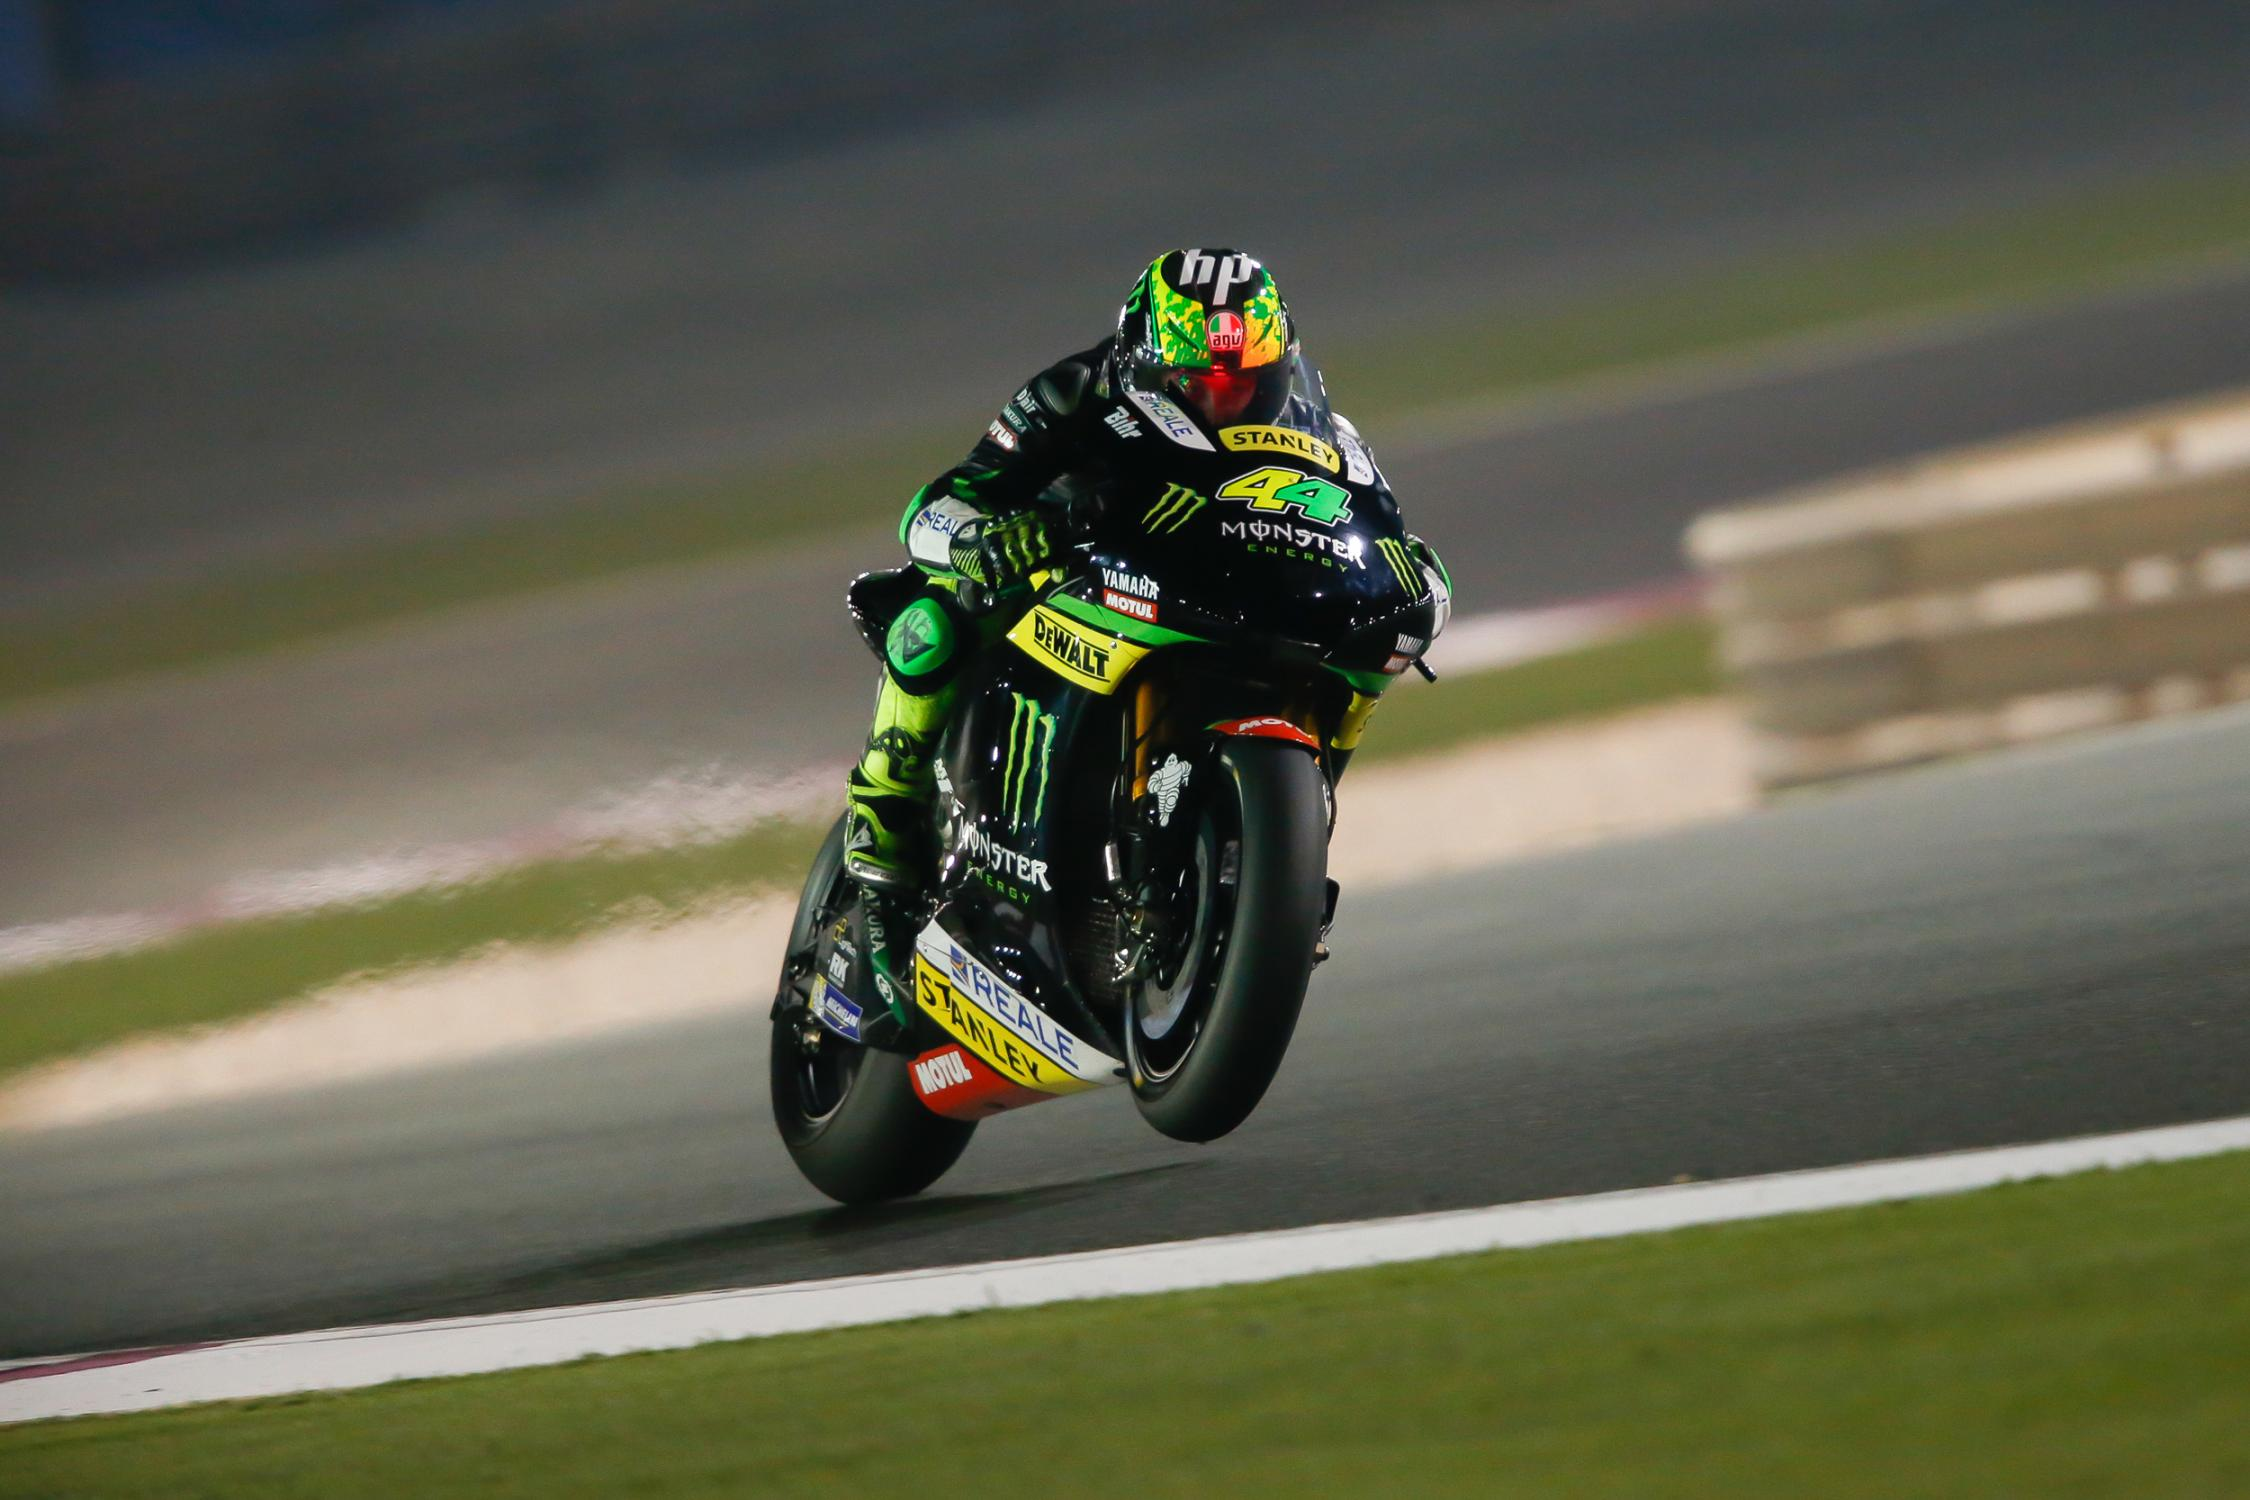 Test MotoGP Qatar 2016 44-espargaro_gp_4638.gallery_full_top_fullscreen